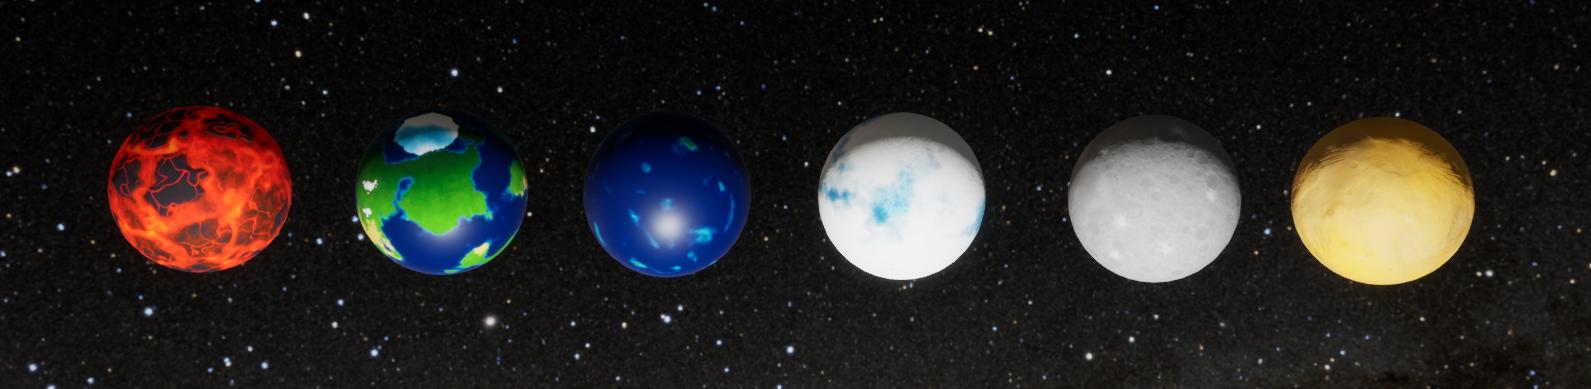 planets | Текстура планеты. Хотел как лучше...